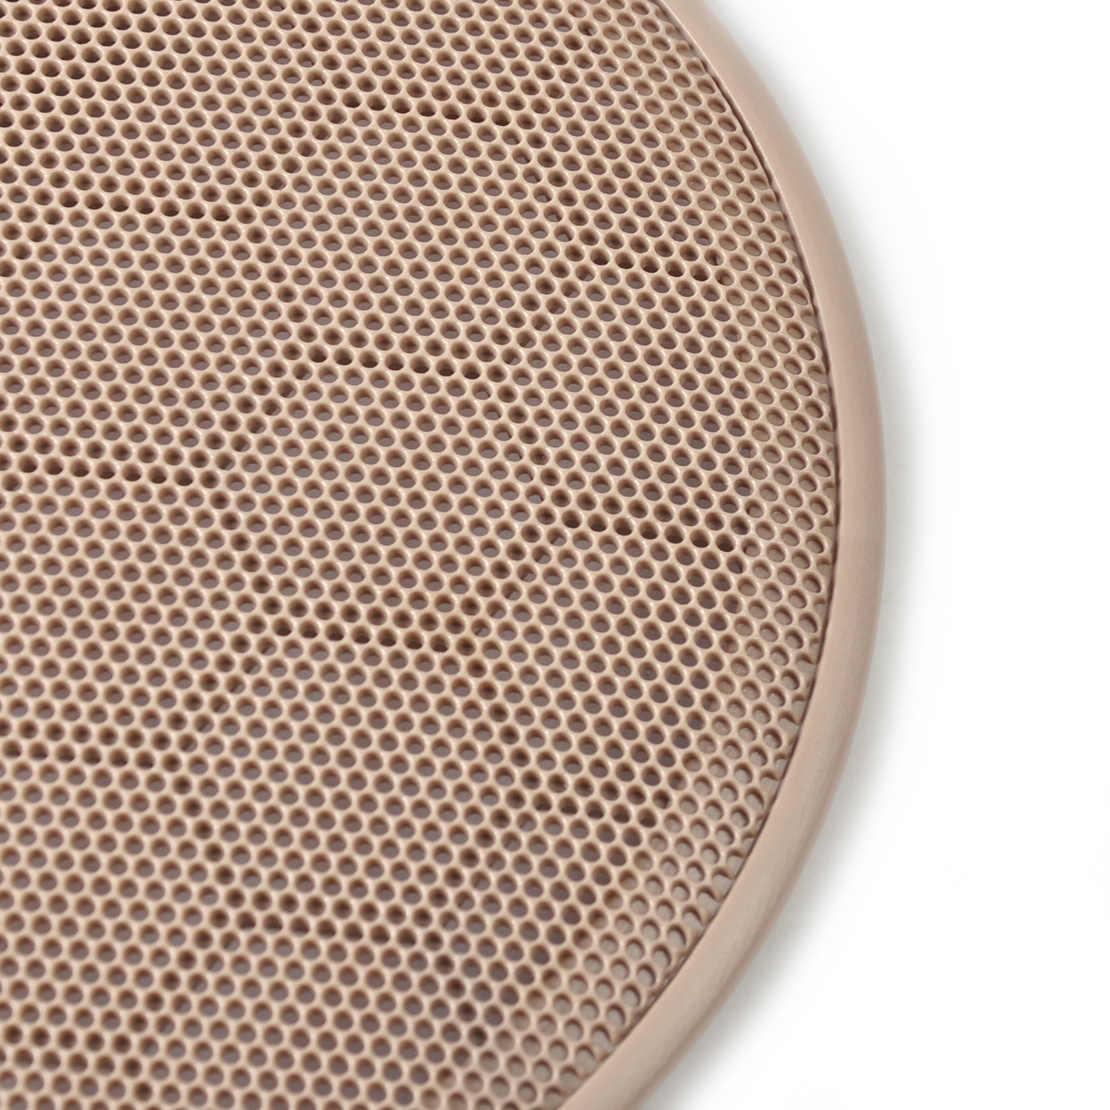 small resolution of  dwcx 2pcs door loud speaker cover grill 3b0868149 for volkswagen passat b5 jetta mk4 golf gti